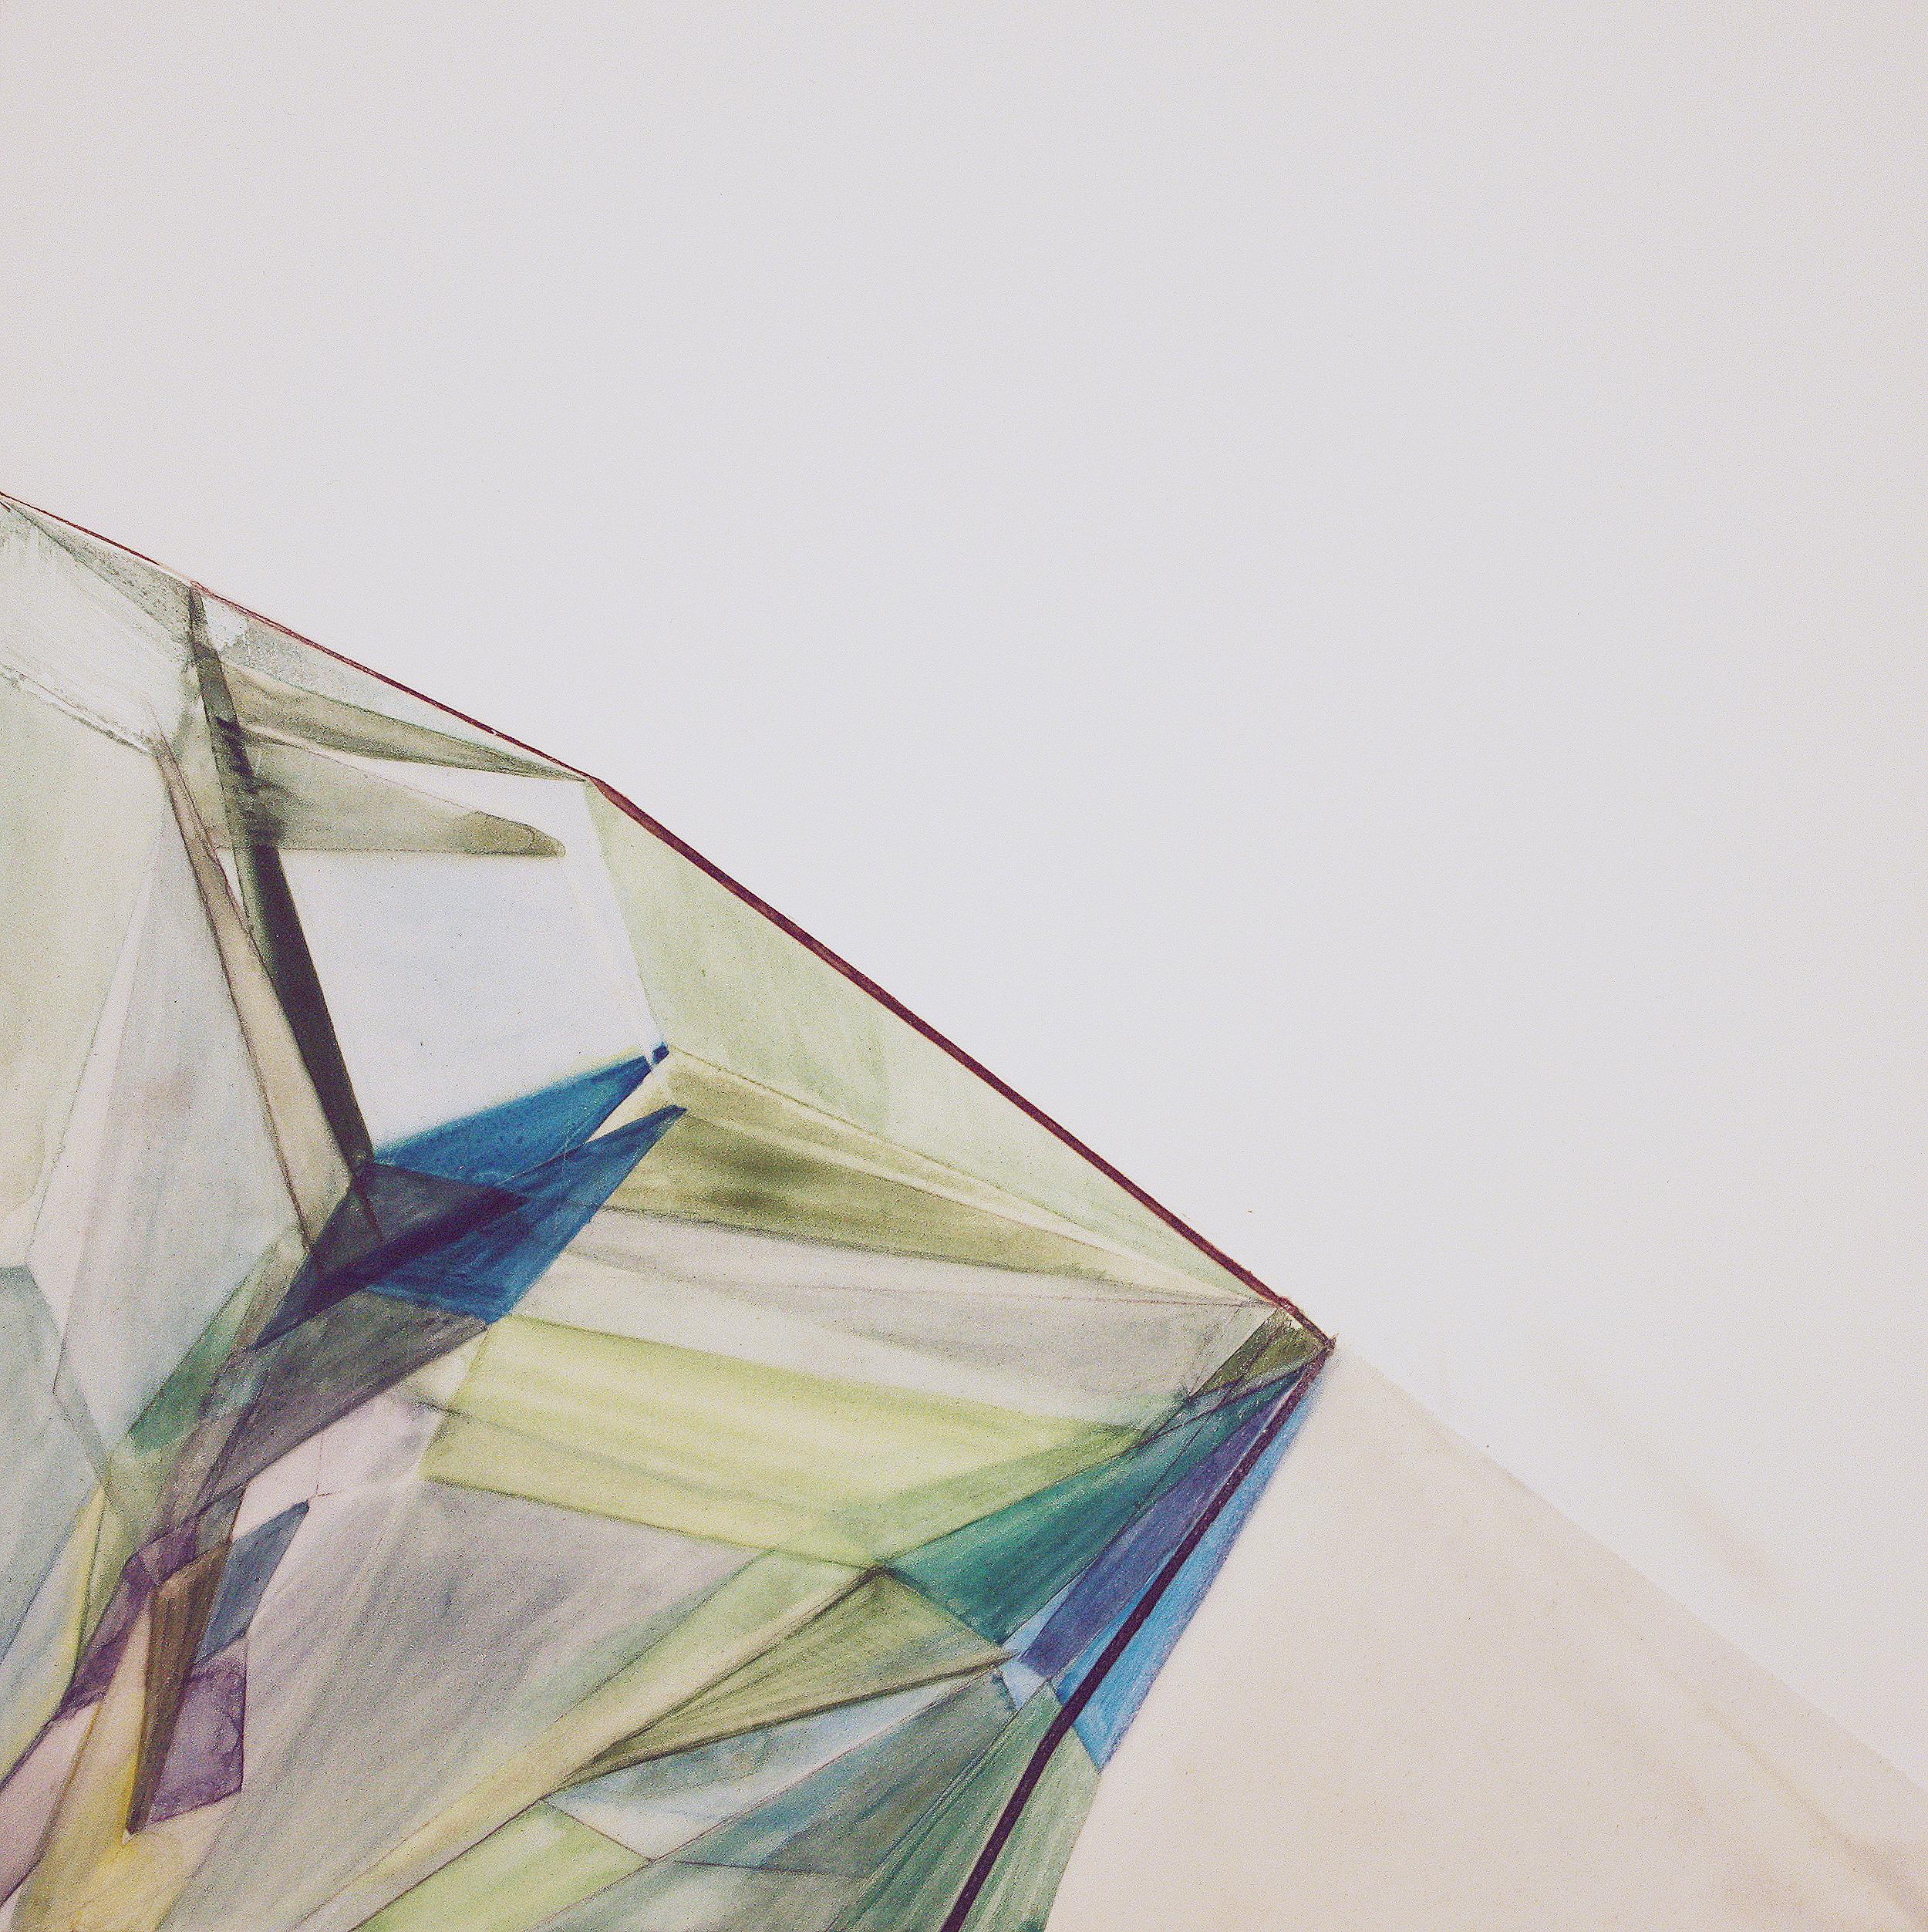 Untitled (blue green), 2012